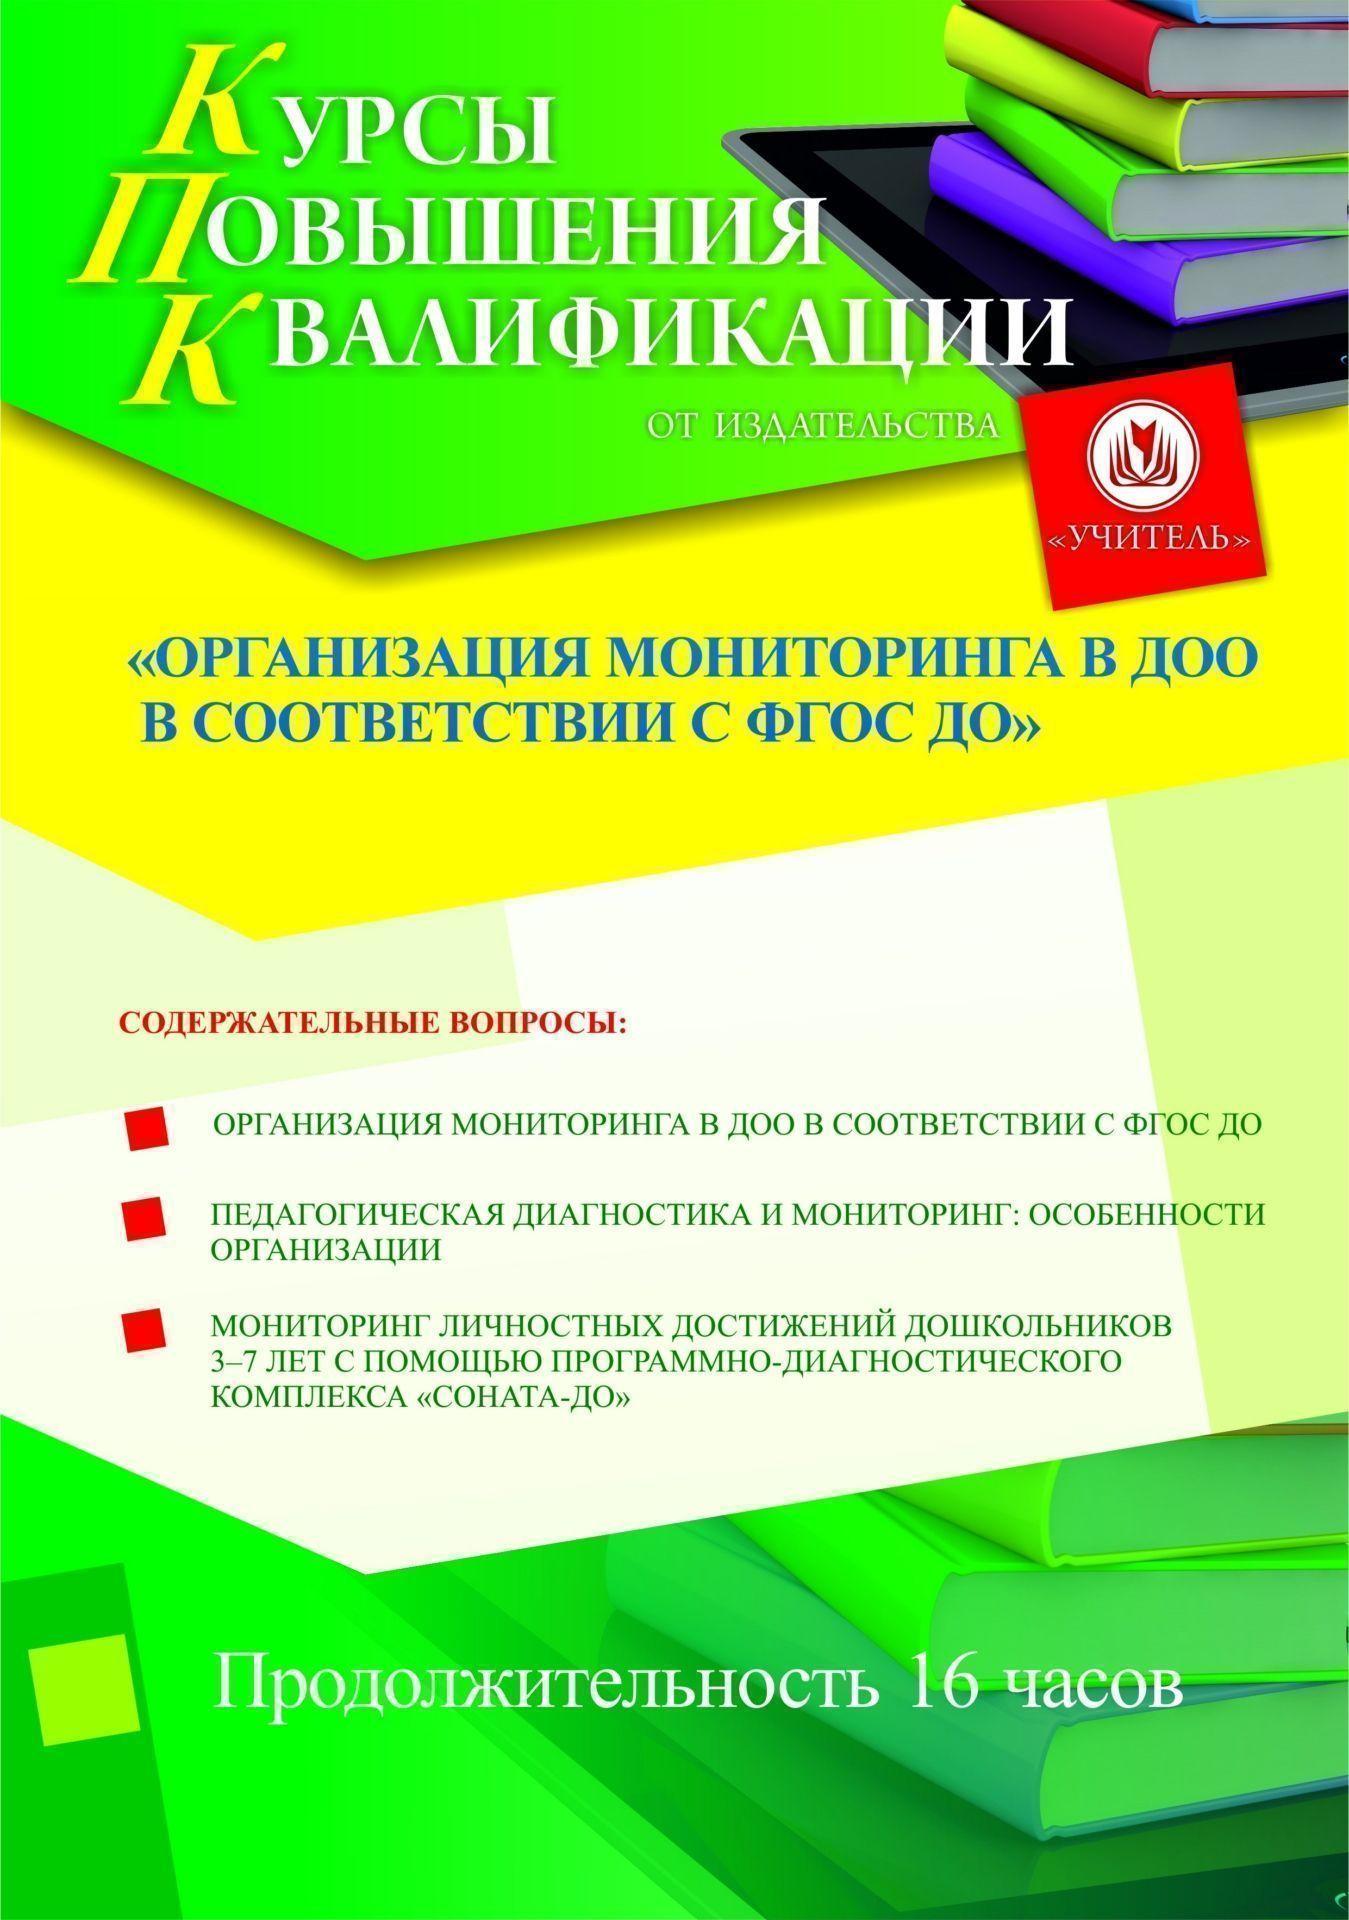 Организация мониторинга в ДОО в соответствии с ФГОС ДО (16 ч.) фото